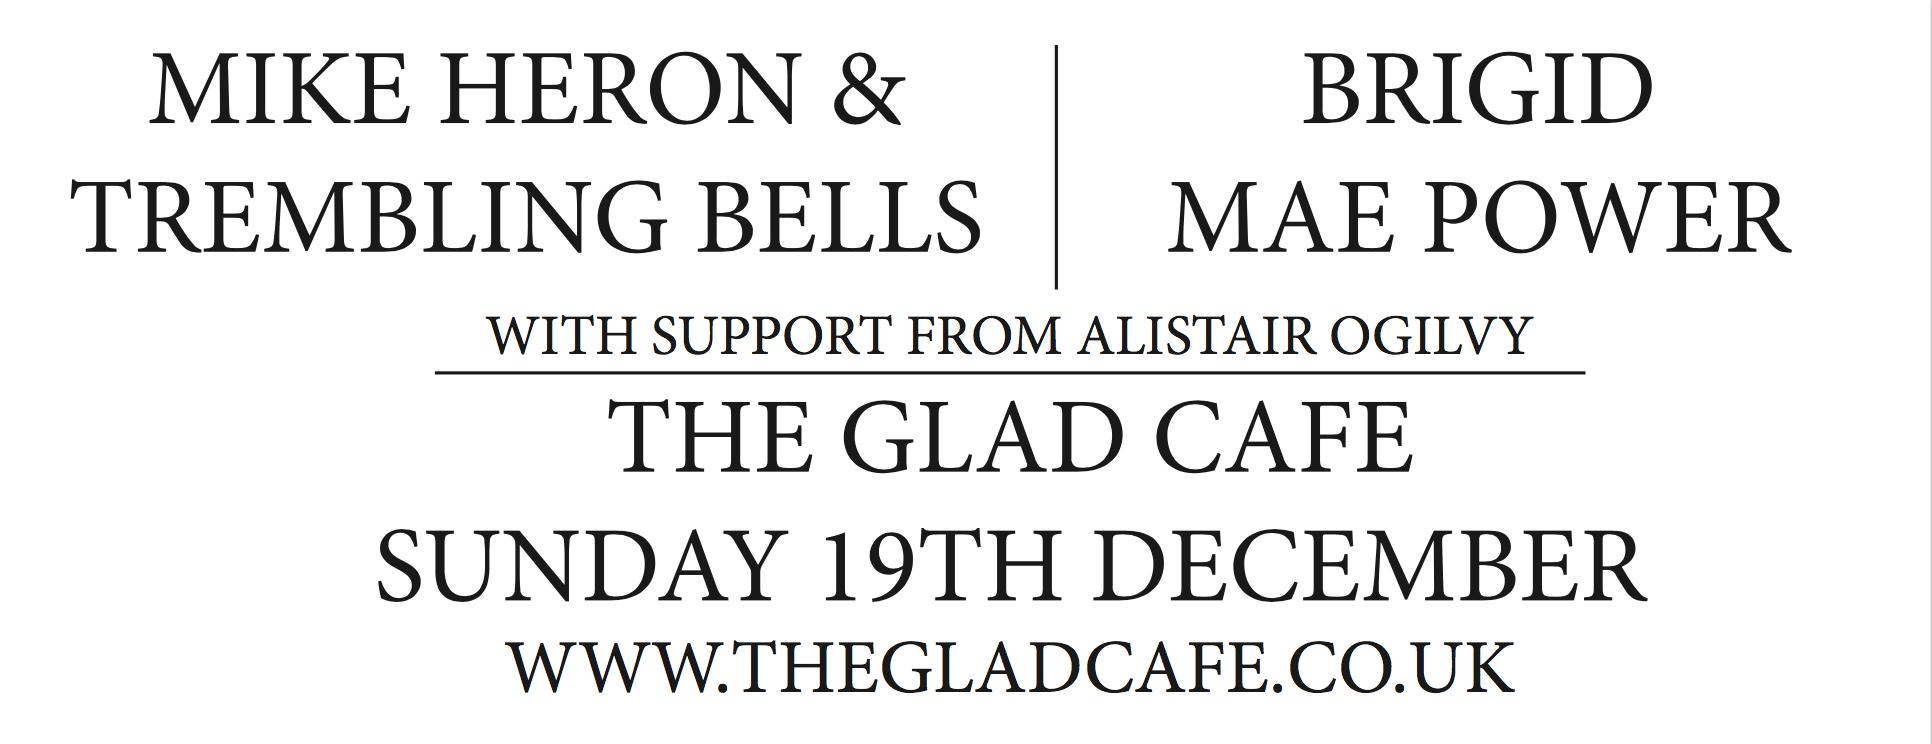 Mike Heron & Trembling Bells + Brigid Mae Power + Alistair Ogilvy